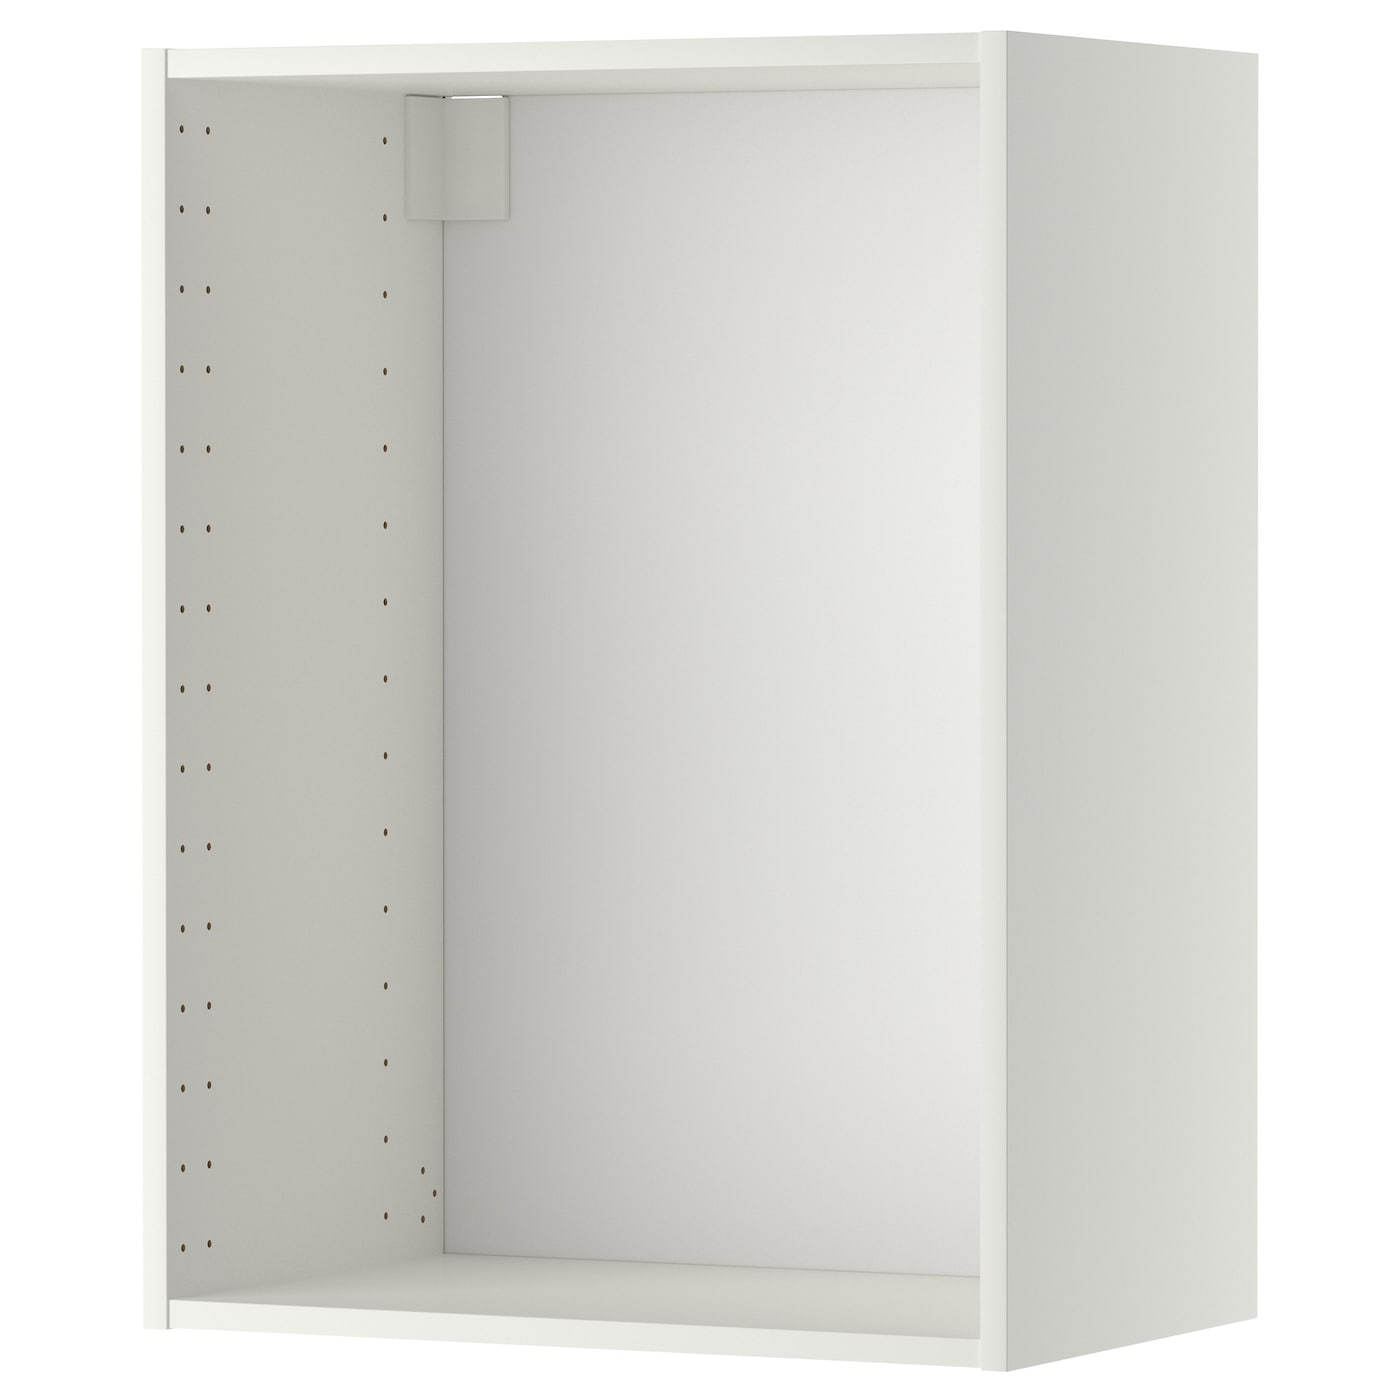 Metod Structure Element Mural Blanc 60x37x80 Cm Ikea